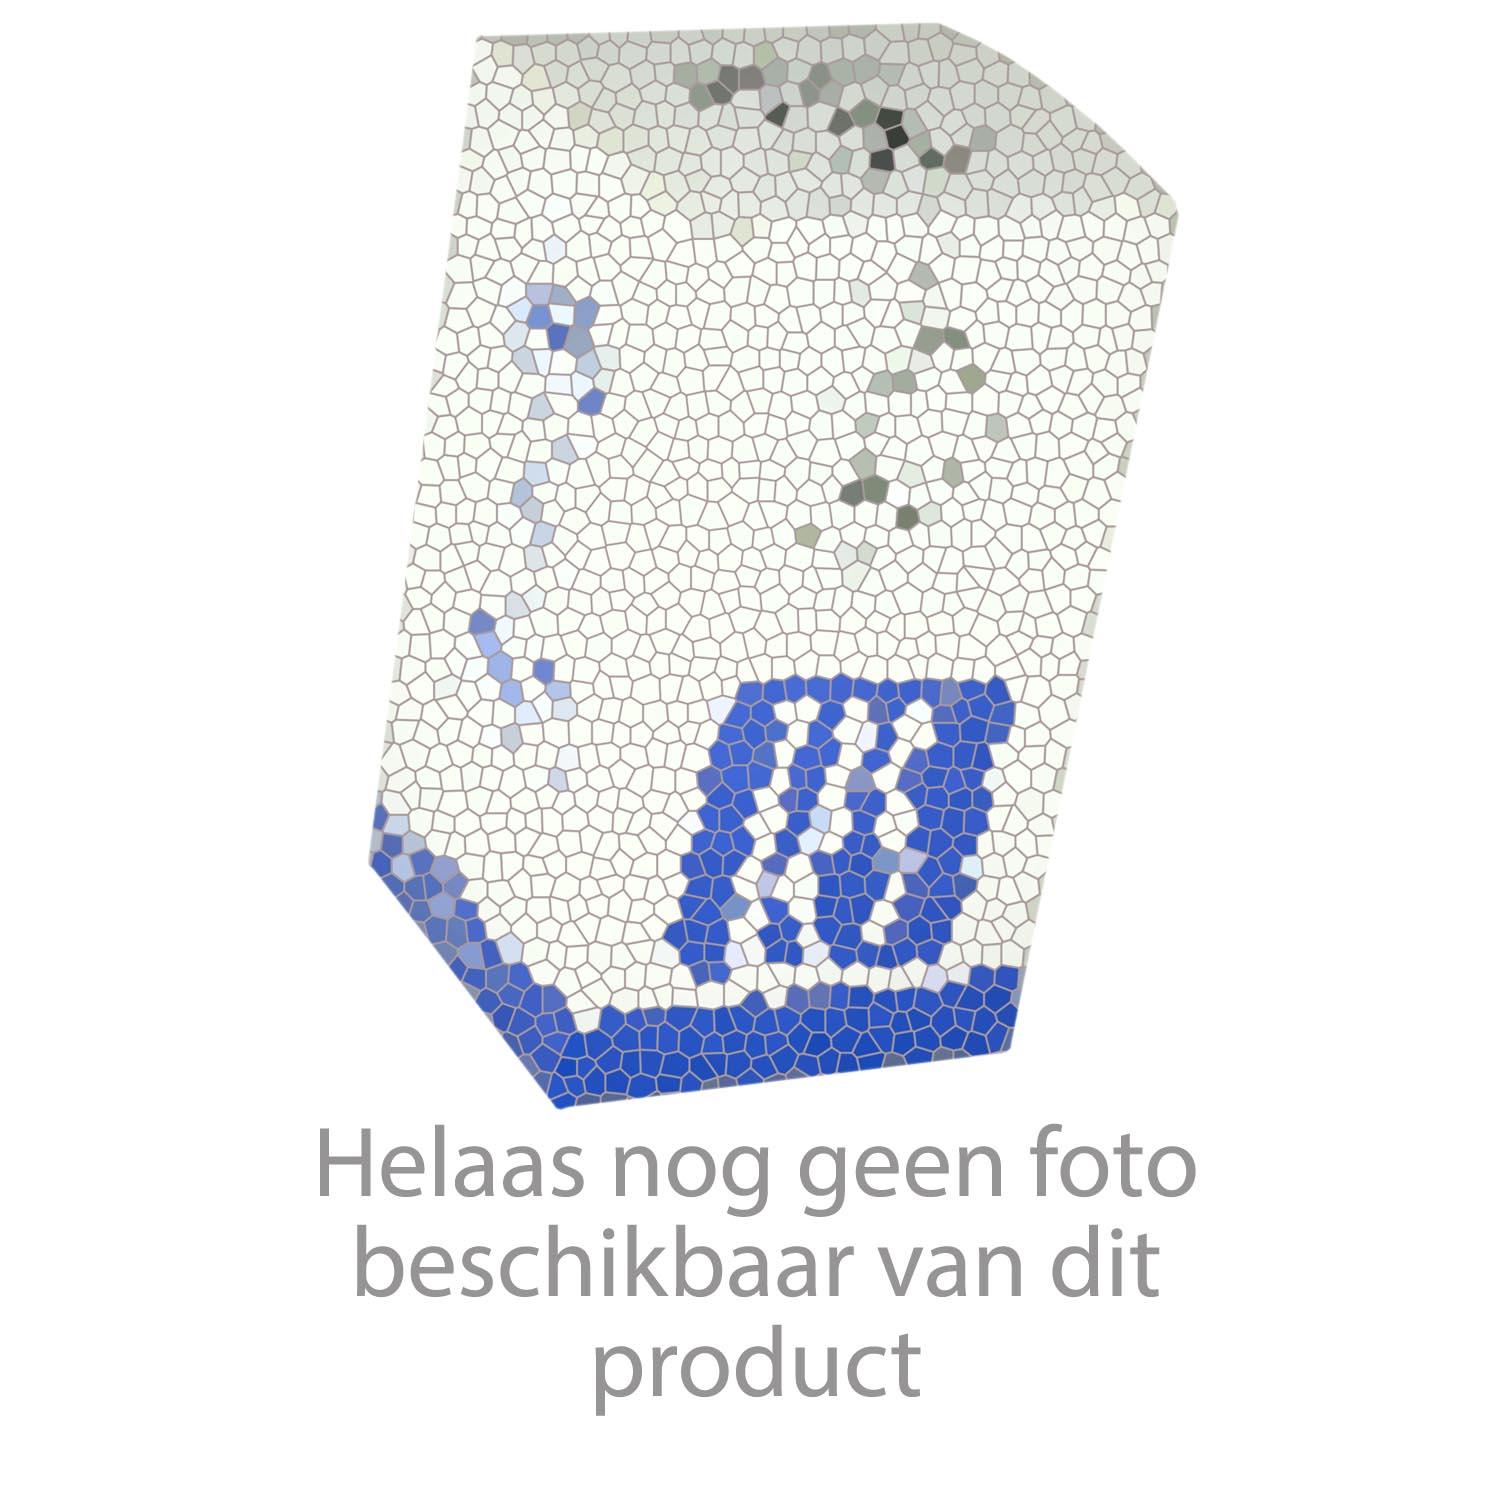 Grohe onderdelen Concetto Wastafelmengkraan Medium M/Waste 23450001